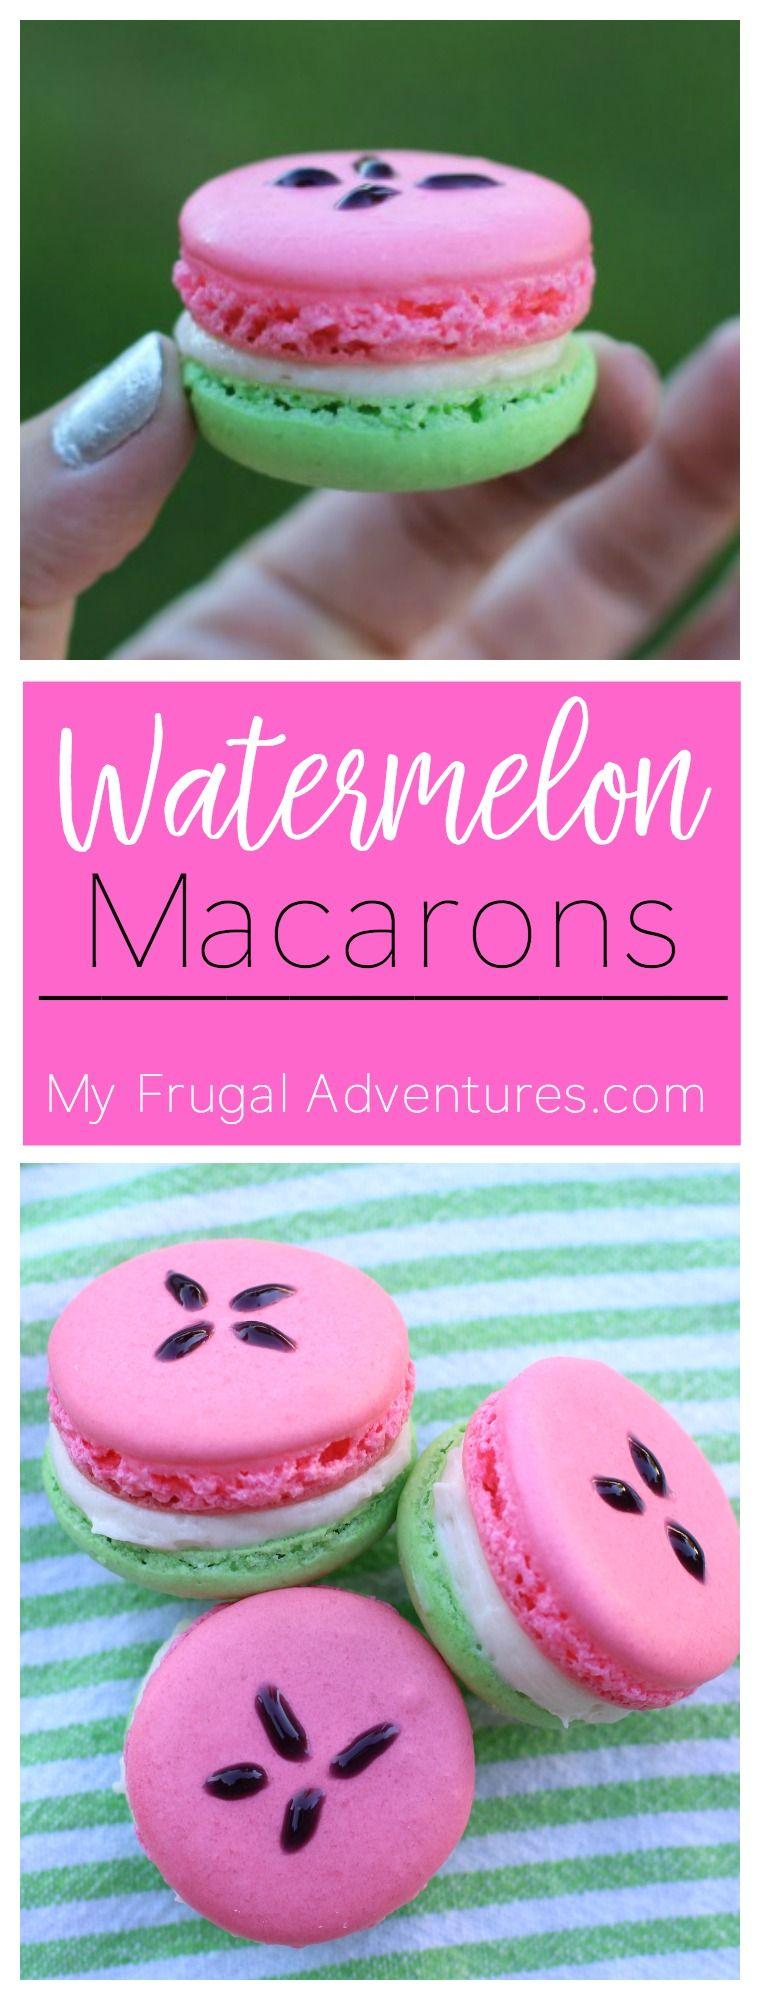 Watermelon Macaron #melonrecipes